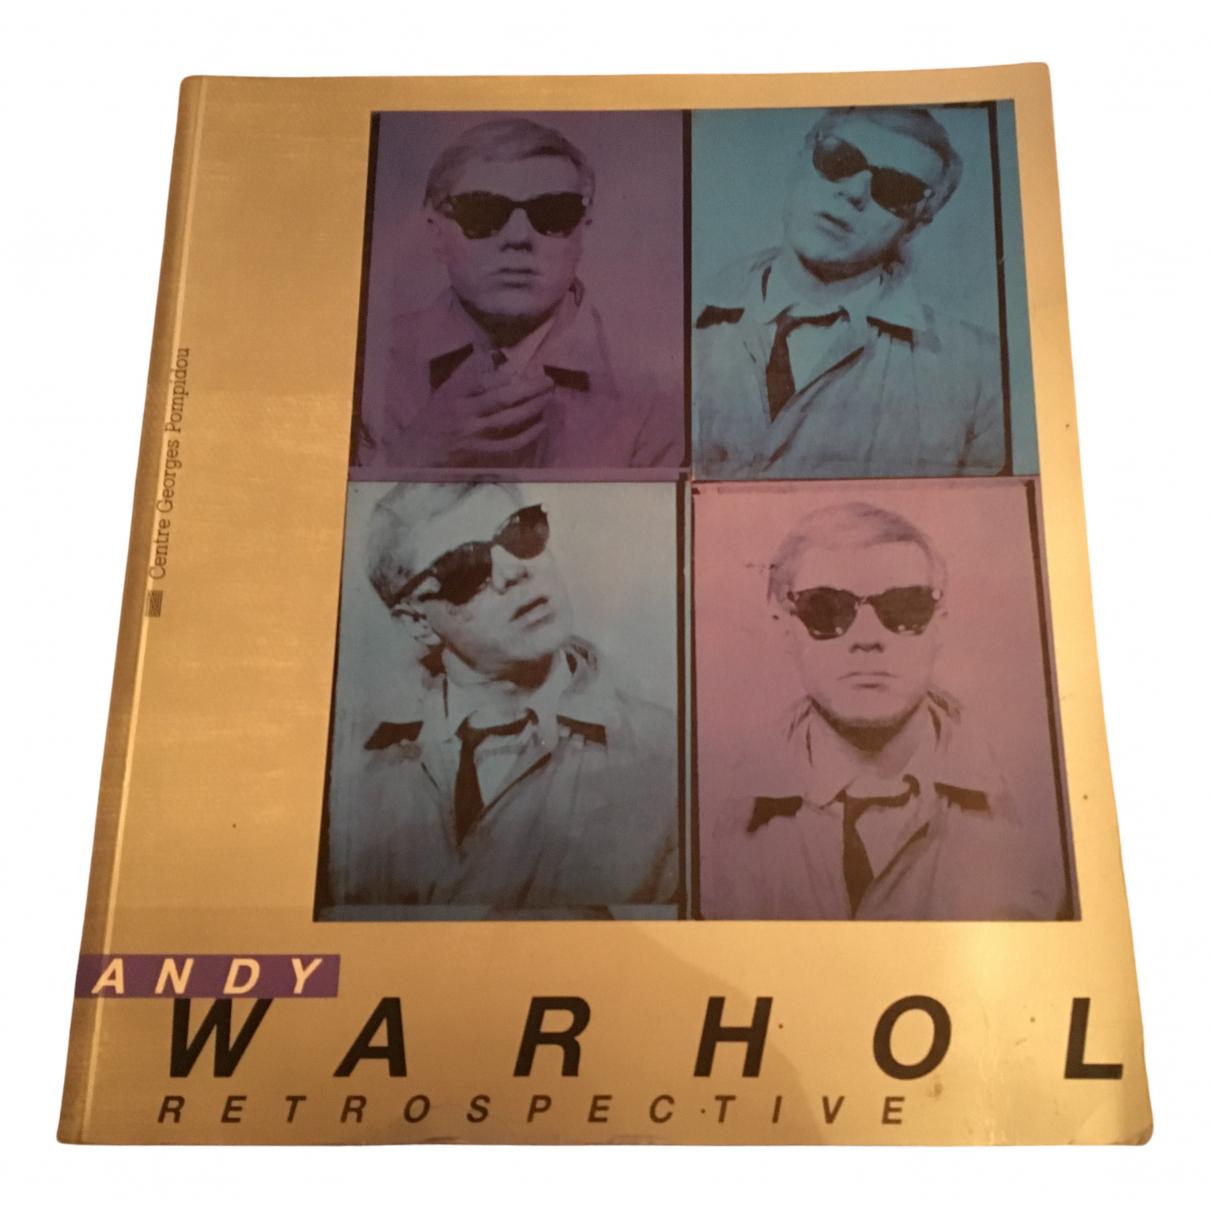 Arte Andy Warhol